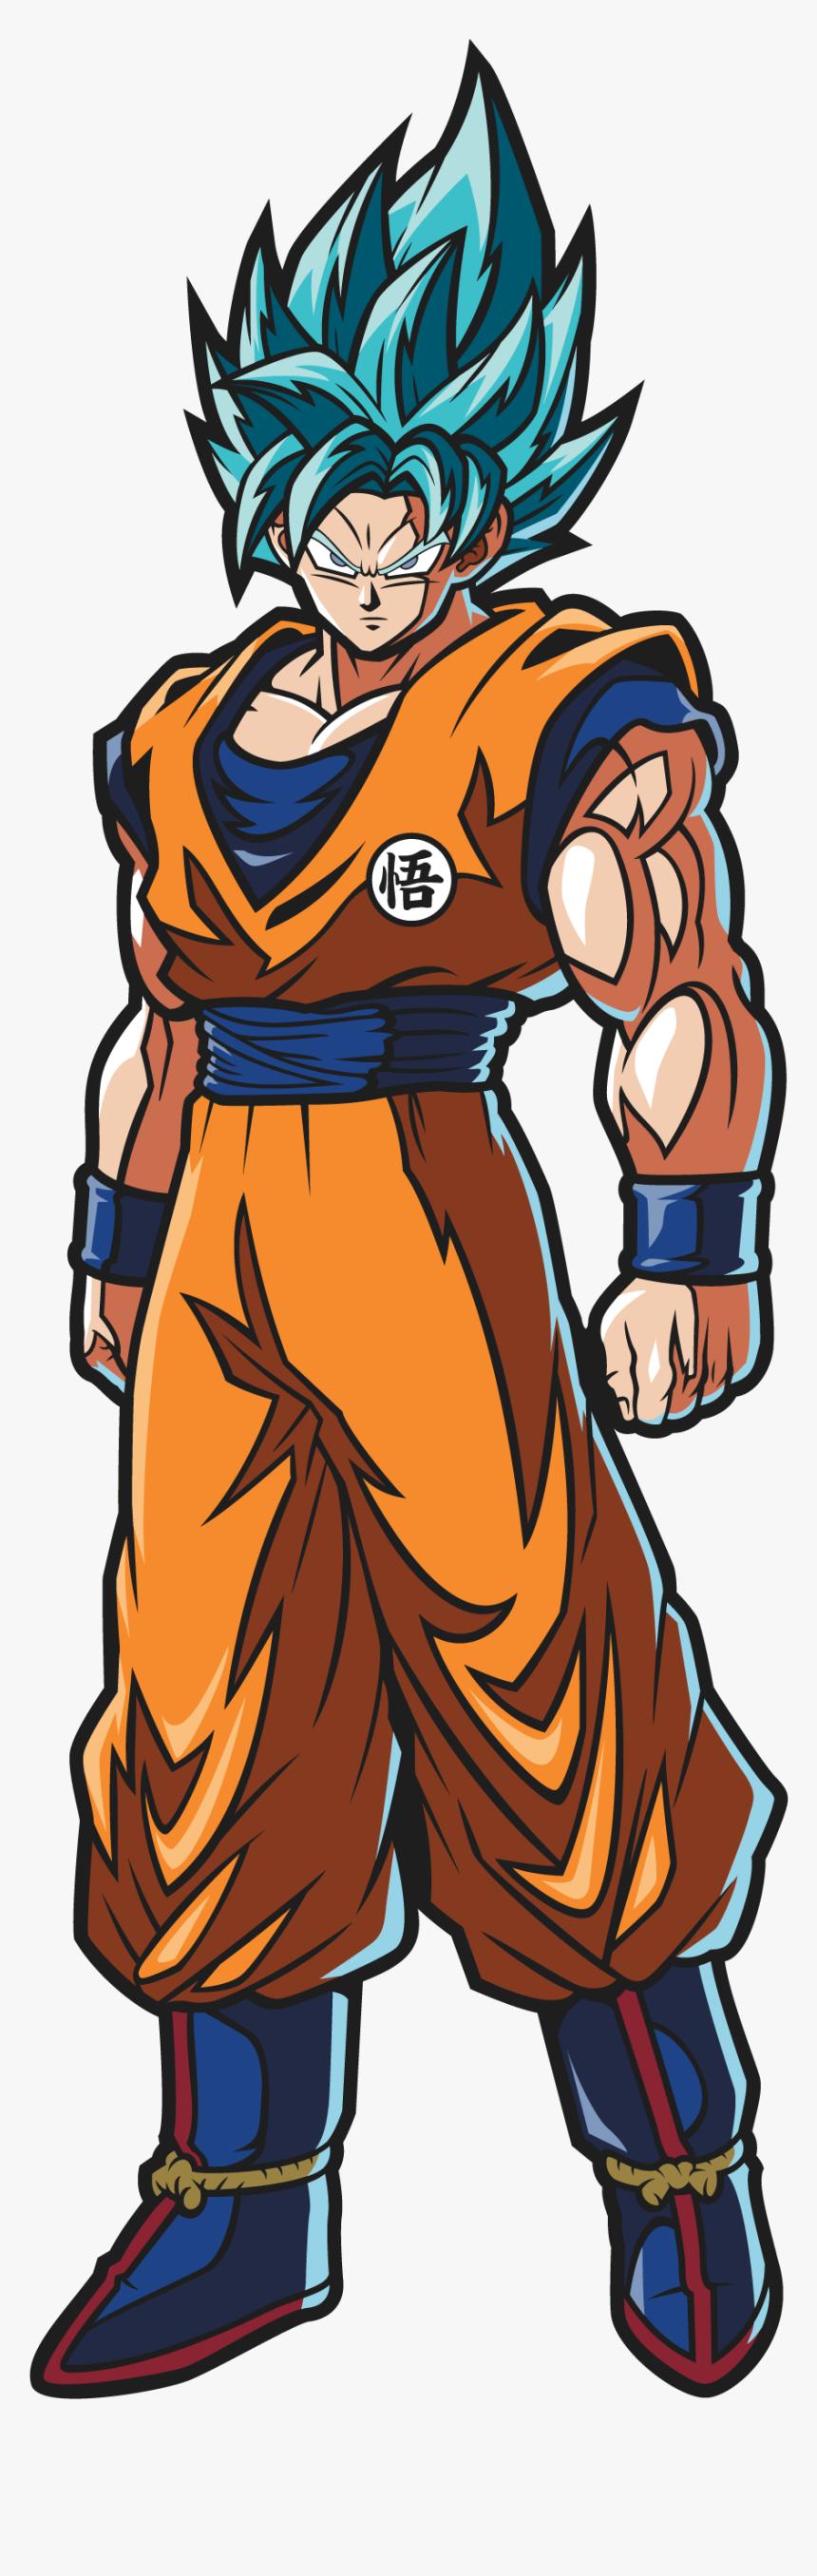 Dragon Ball Fighterz Ssj Goku, HD Png Download, Free Download